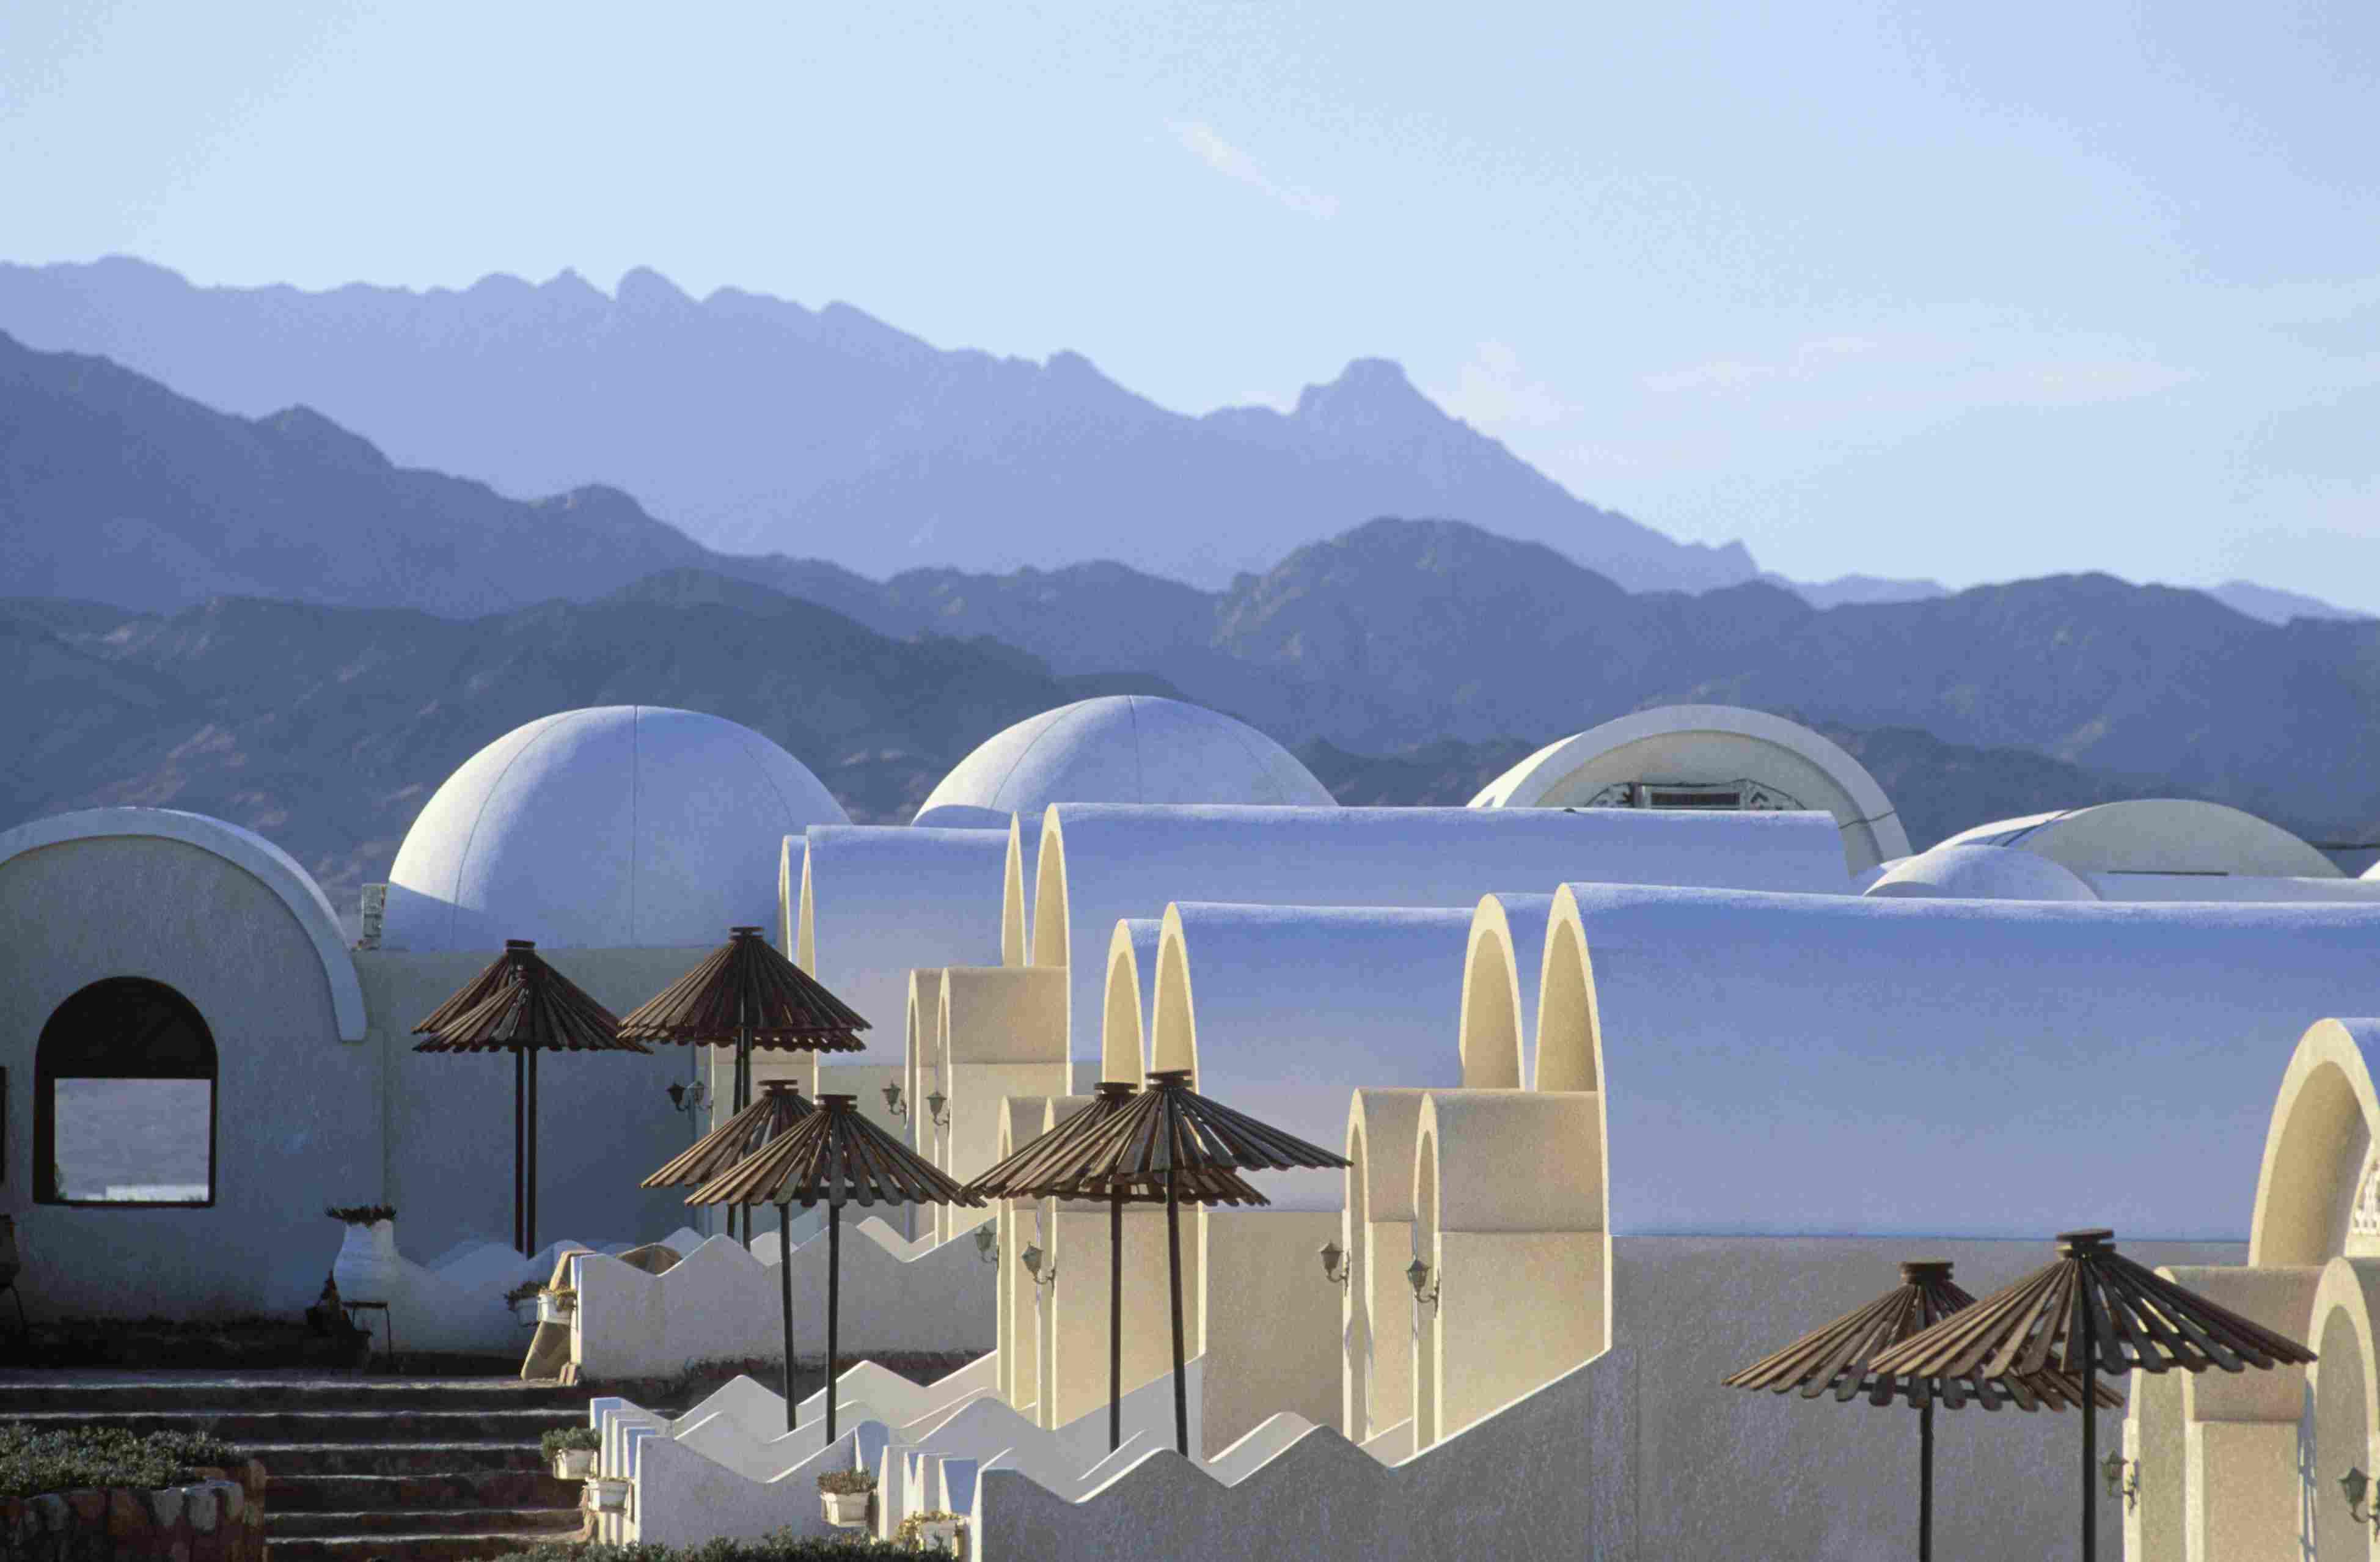 Building and mountains, Dahab, Gulf of Aqaba, Sinai, Egypt